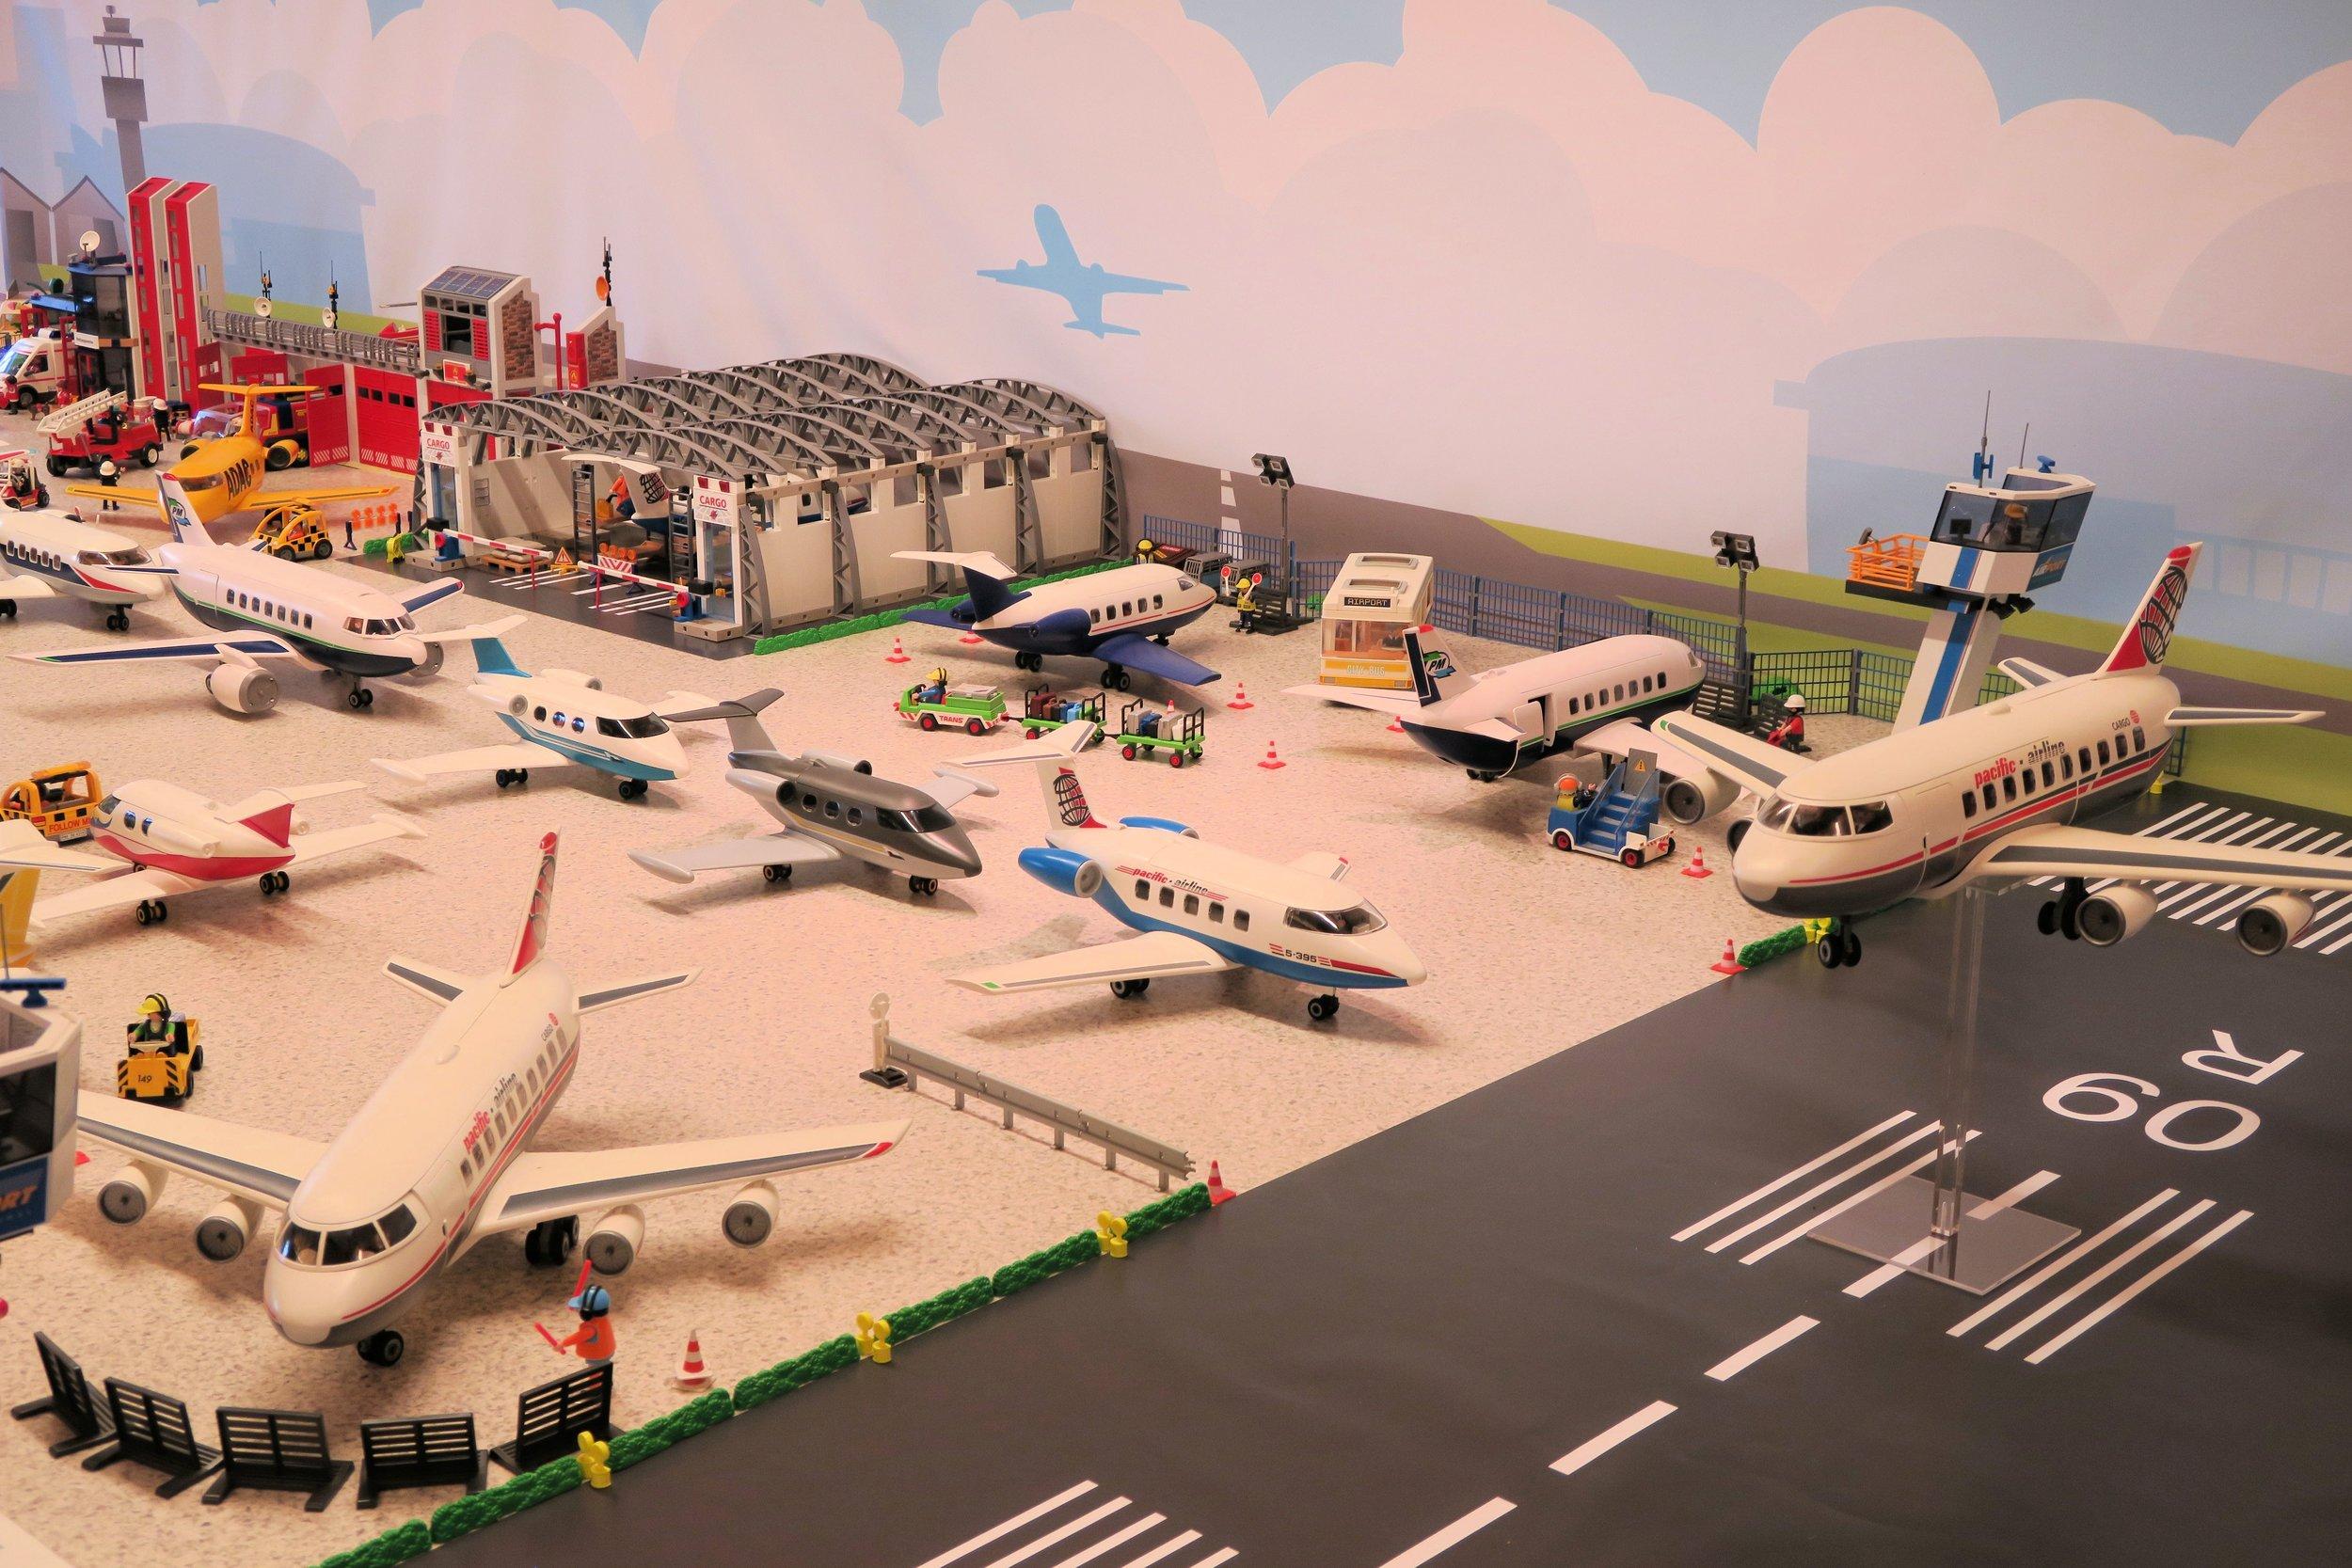 Hajo Brandenburg - Airport01.jpg